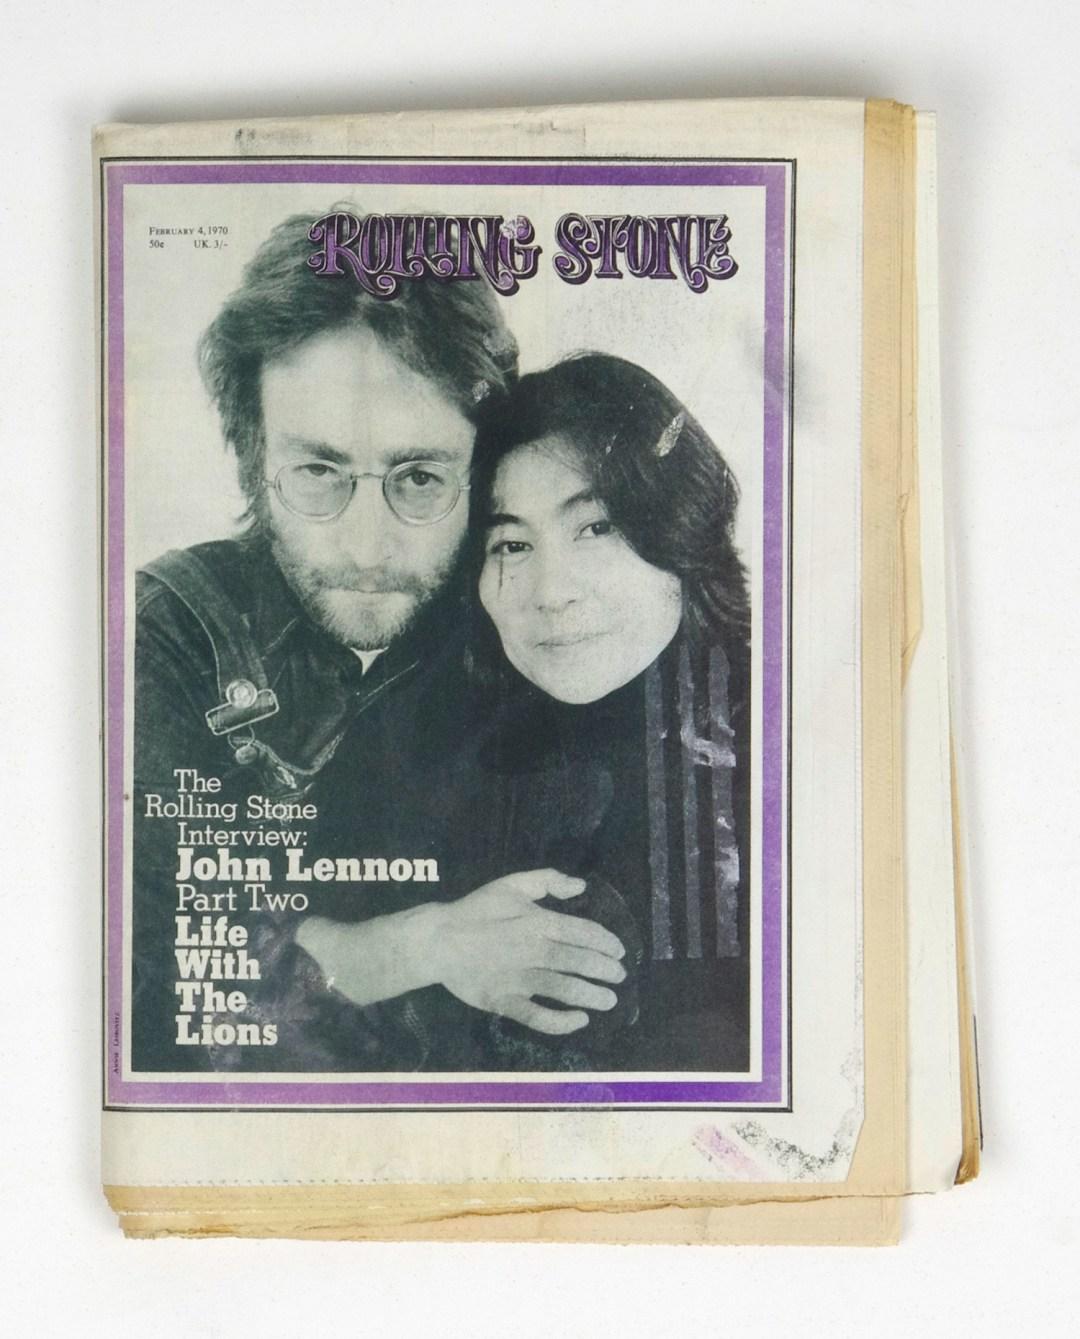 Rolling Stone Magazine 1970 Feb 4 No. 51 John Lennon Yoko Ono